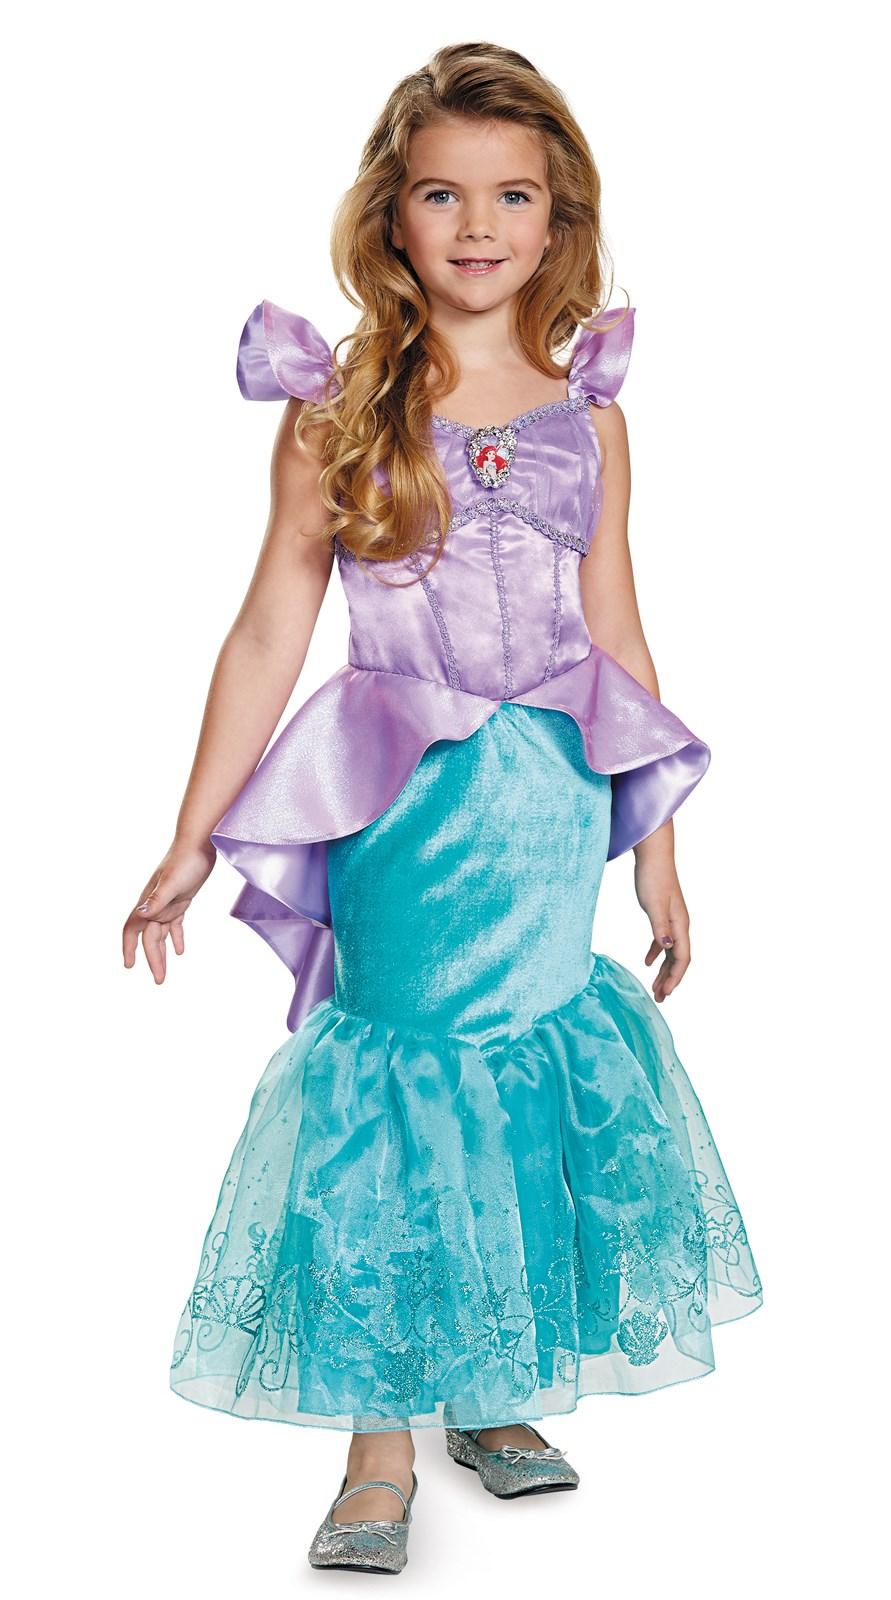 The Little Mermaid Storybook Ariel Prestige Toddler / Child Costume ...